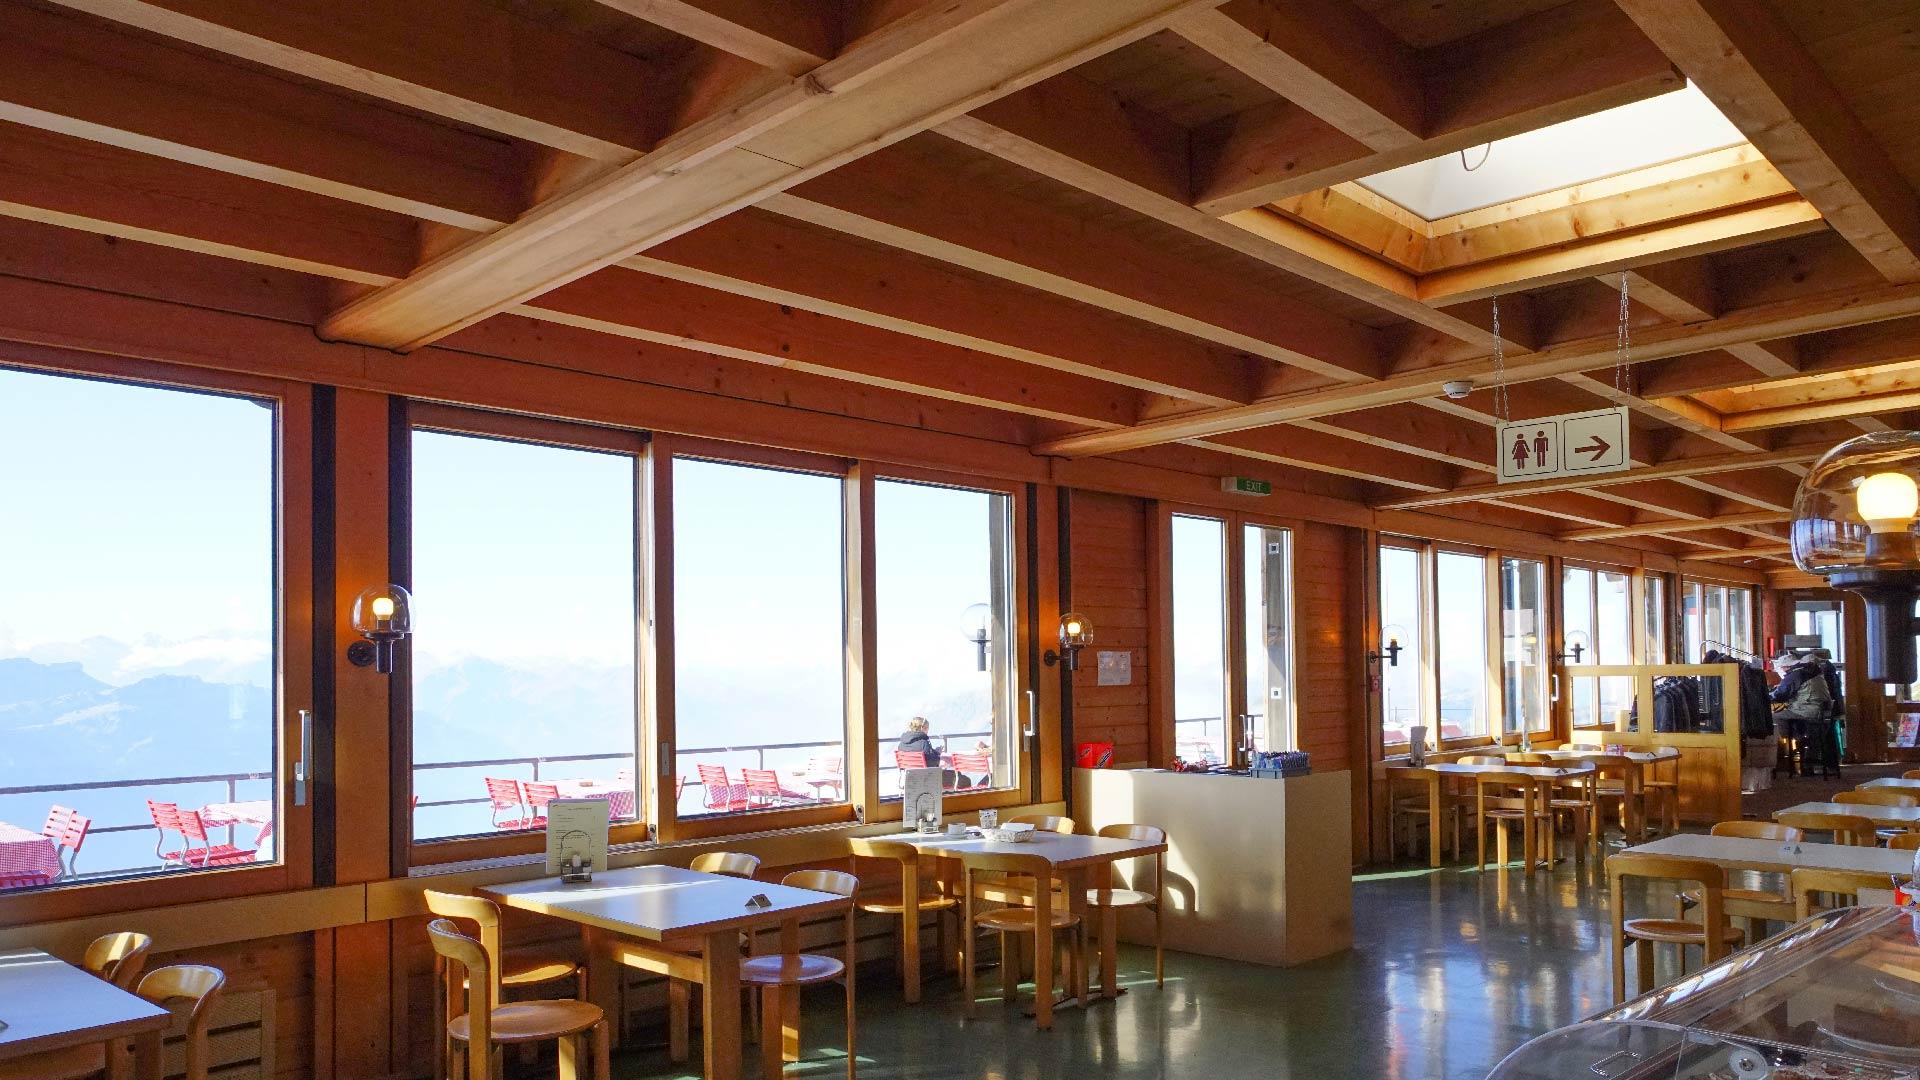 bergrestaurant-rothorn-kulm-eingang